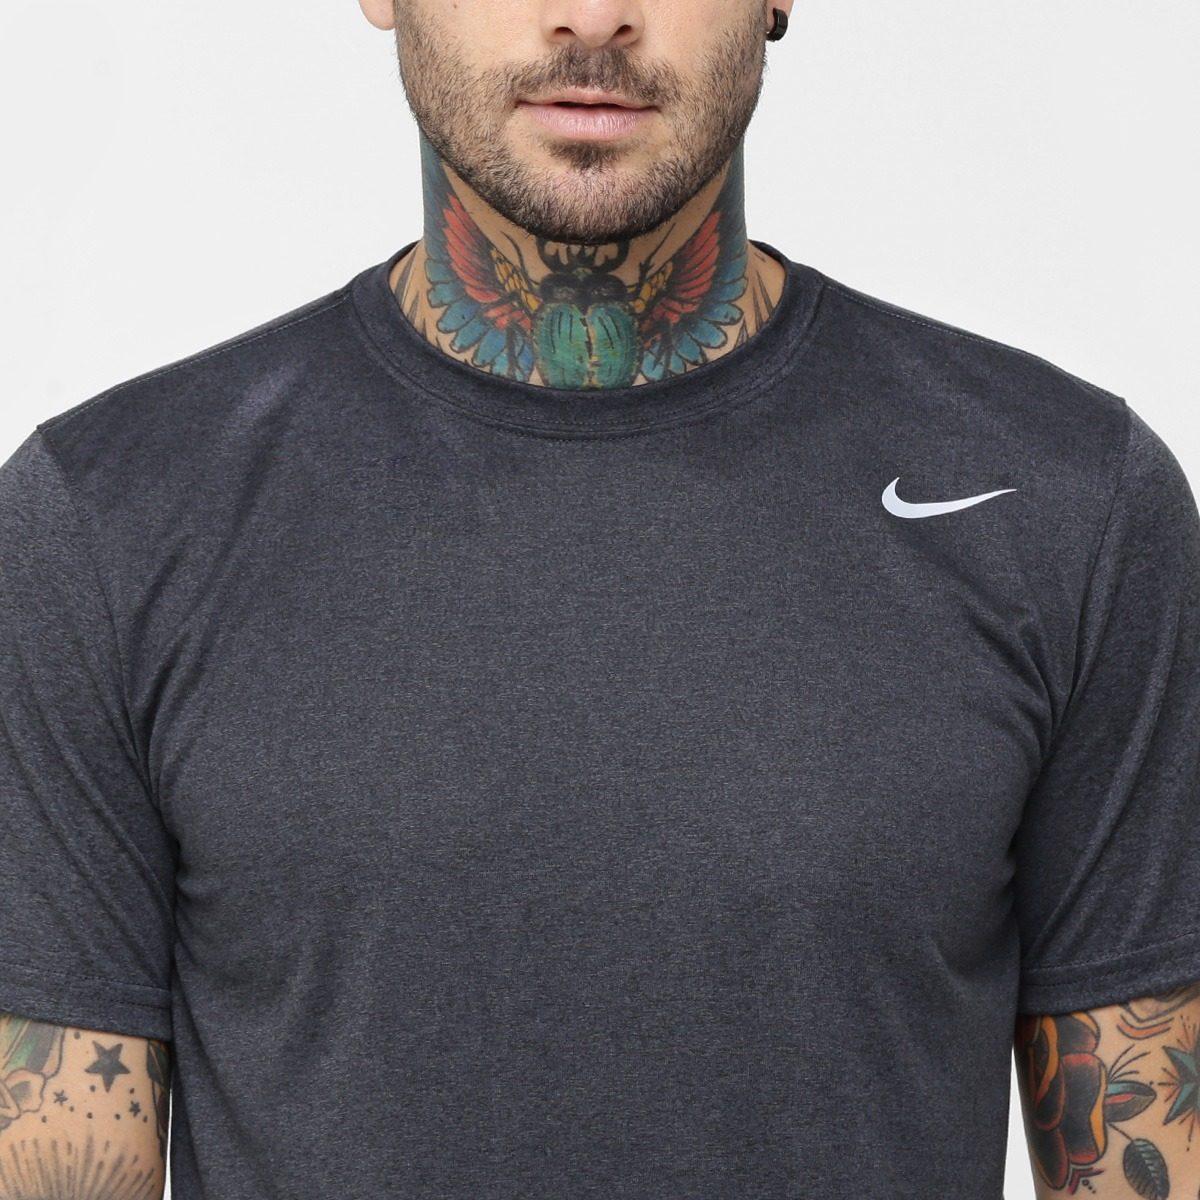 fcc9ef85ed69d camiseta nike legend 2.0 ss masculina. Carregando zoom.